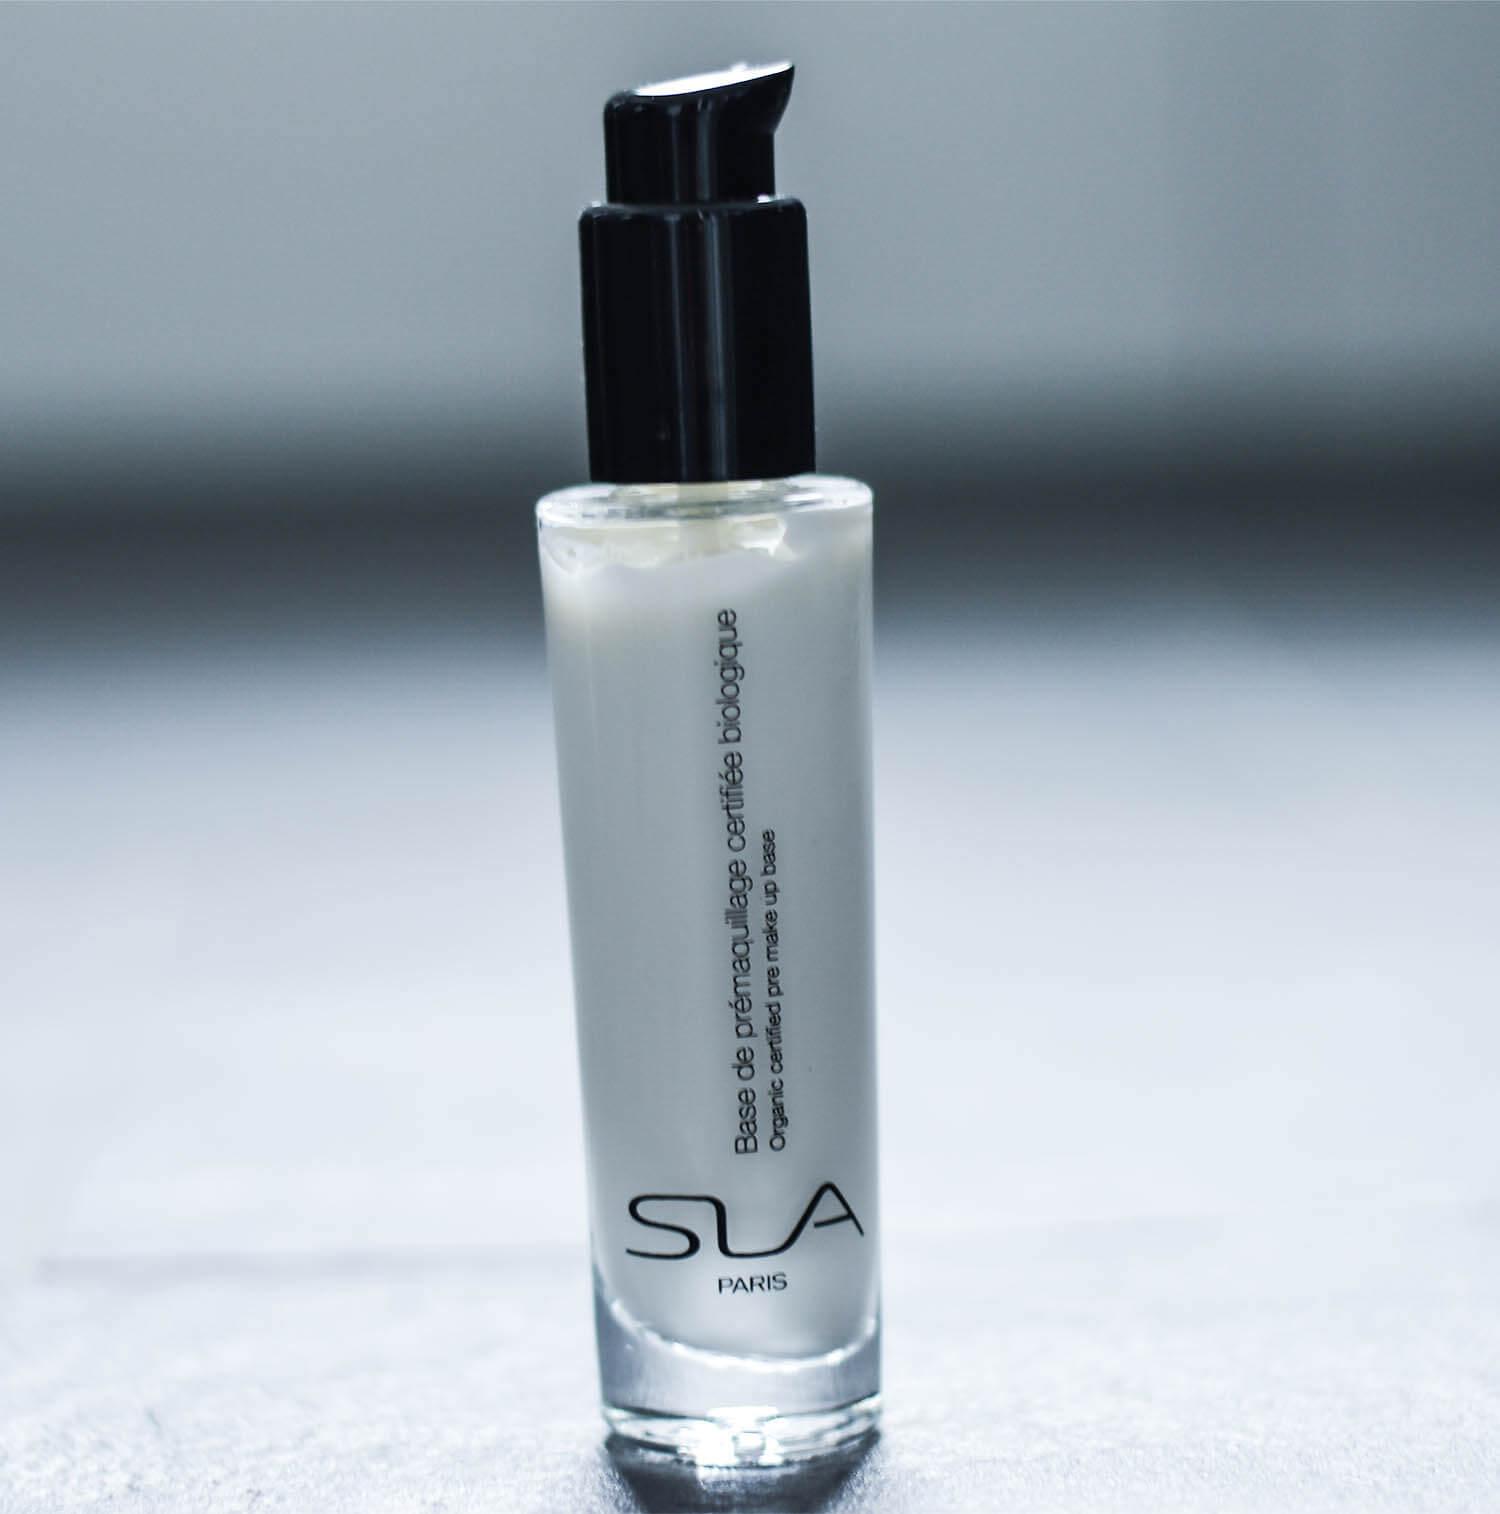 Kationette-lifestyleblog-beauty-Lifestyle-Contouring-Serum-Perfume-Primer-Highlighter-producttest